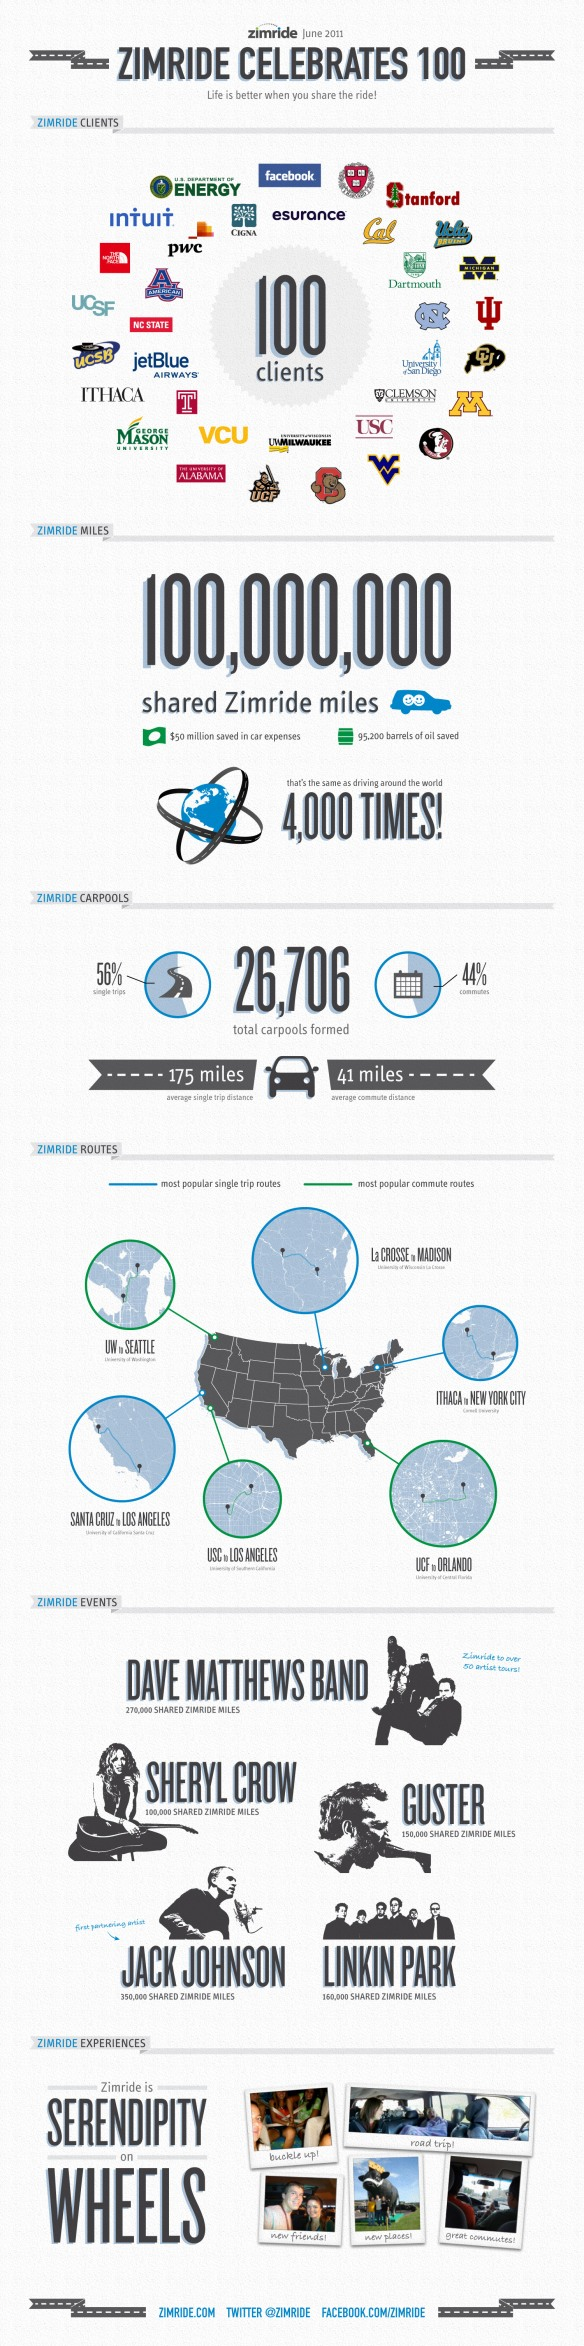 Zimride 100 Infographic